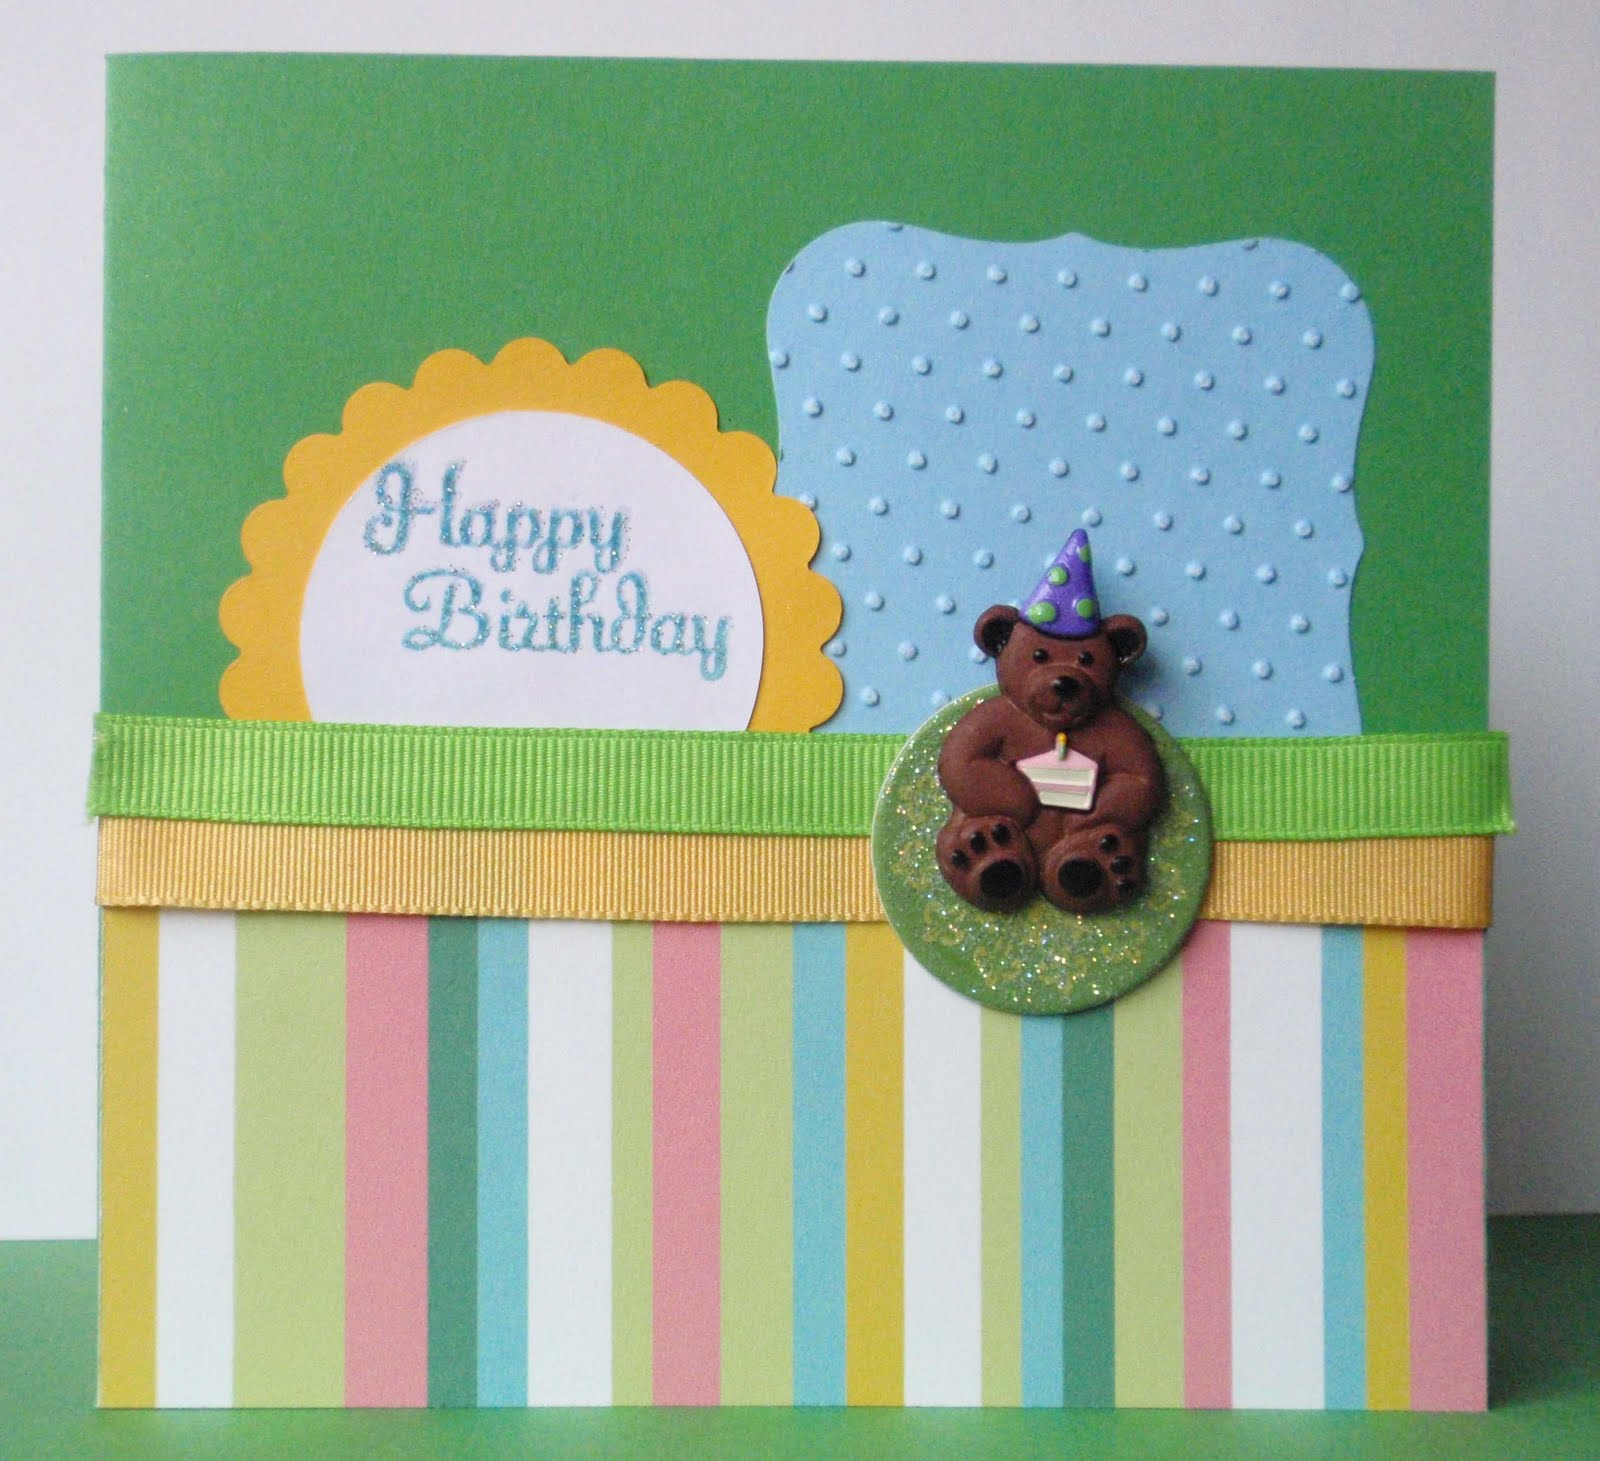 Tarjeta de cumpleaños / Happy birthday card | De Scrapbook & Animales ...